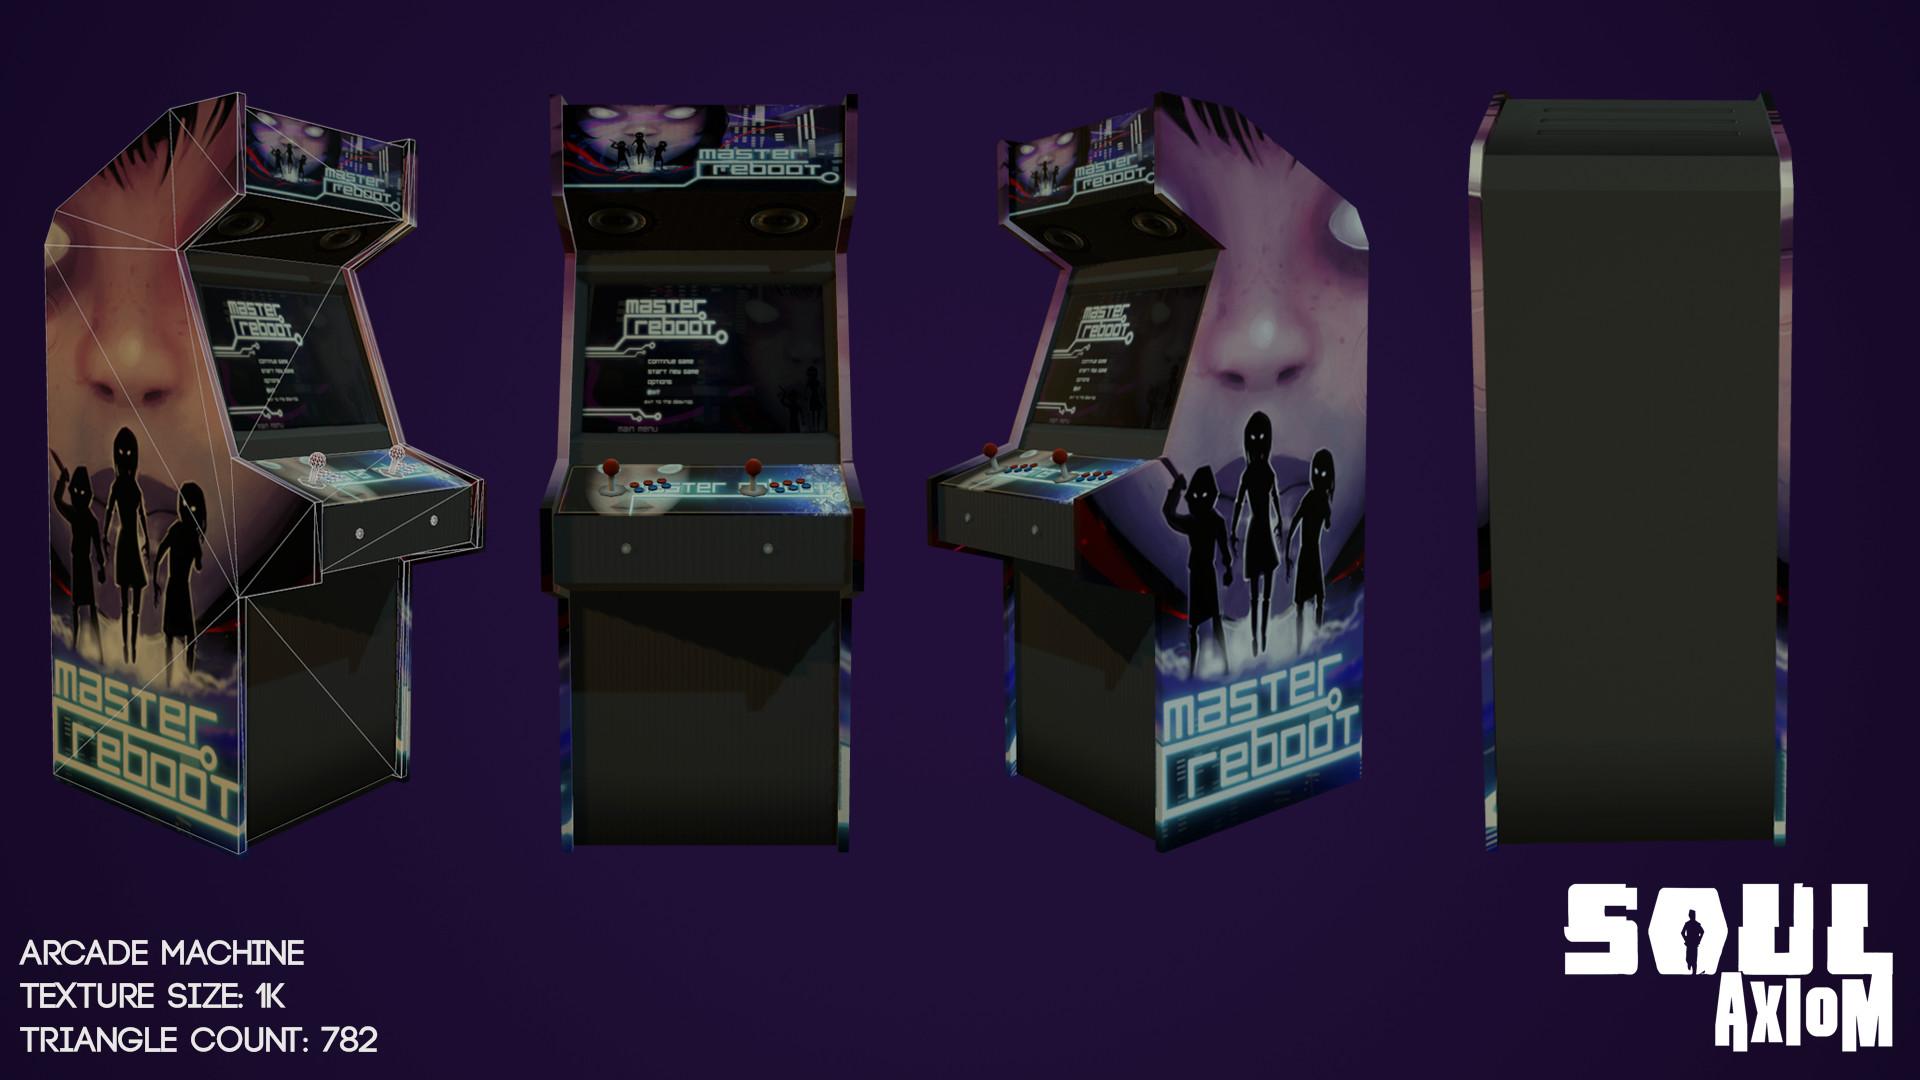 Martin giles arcade machine 002